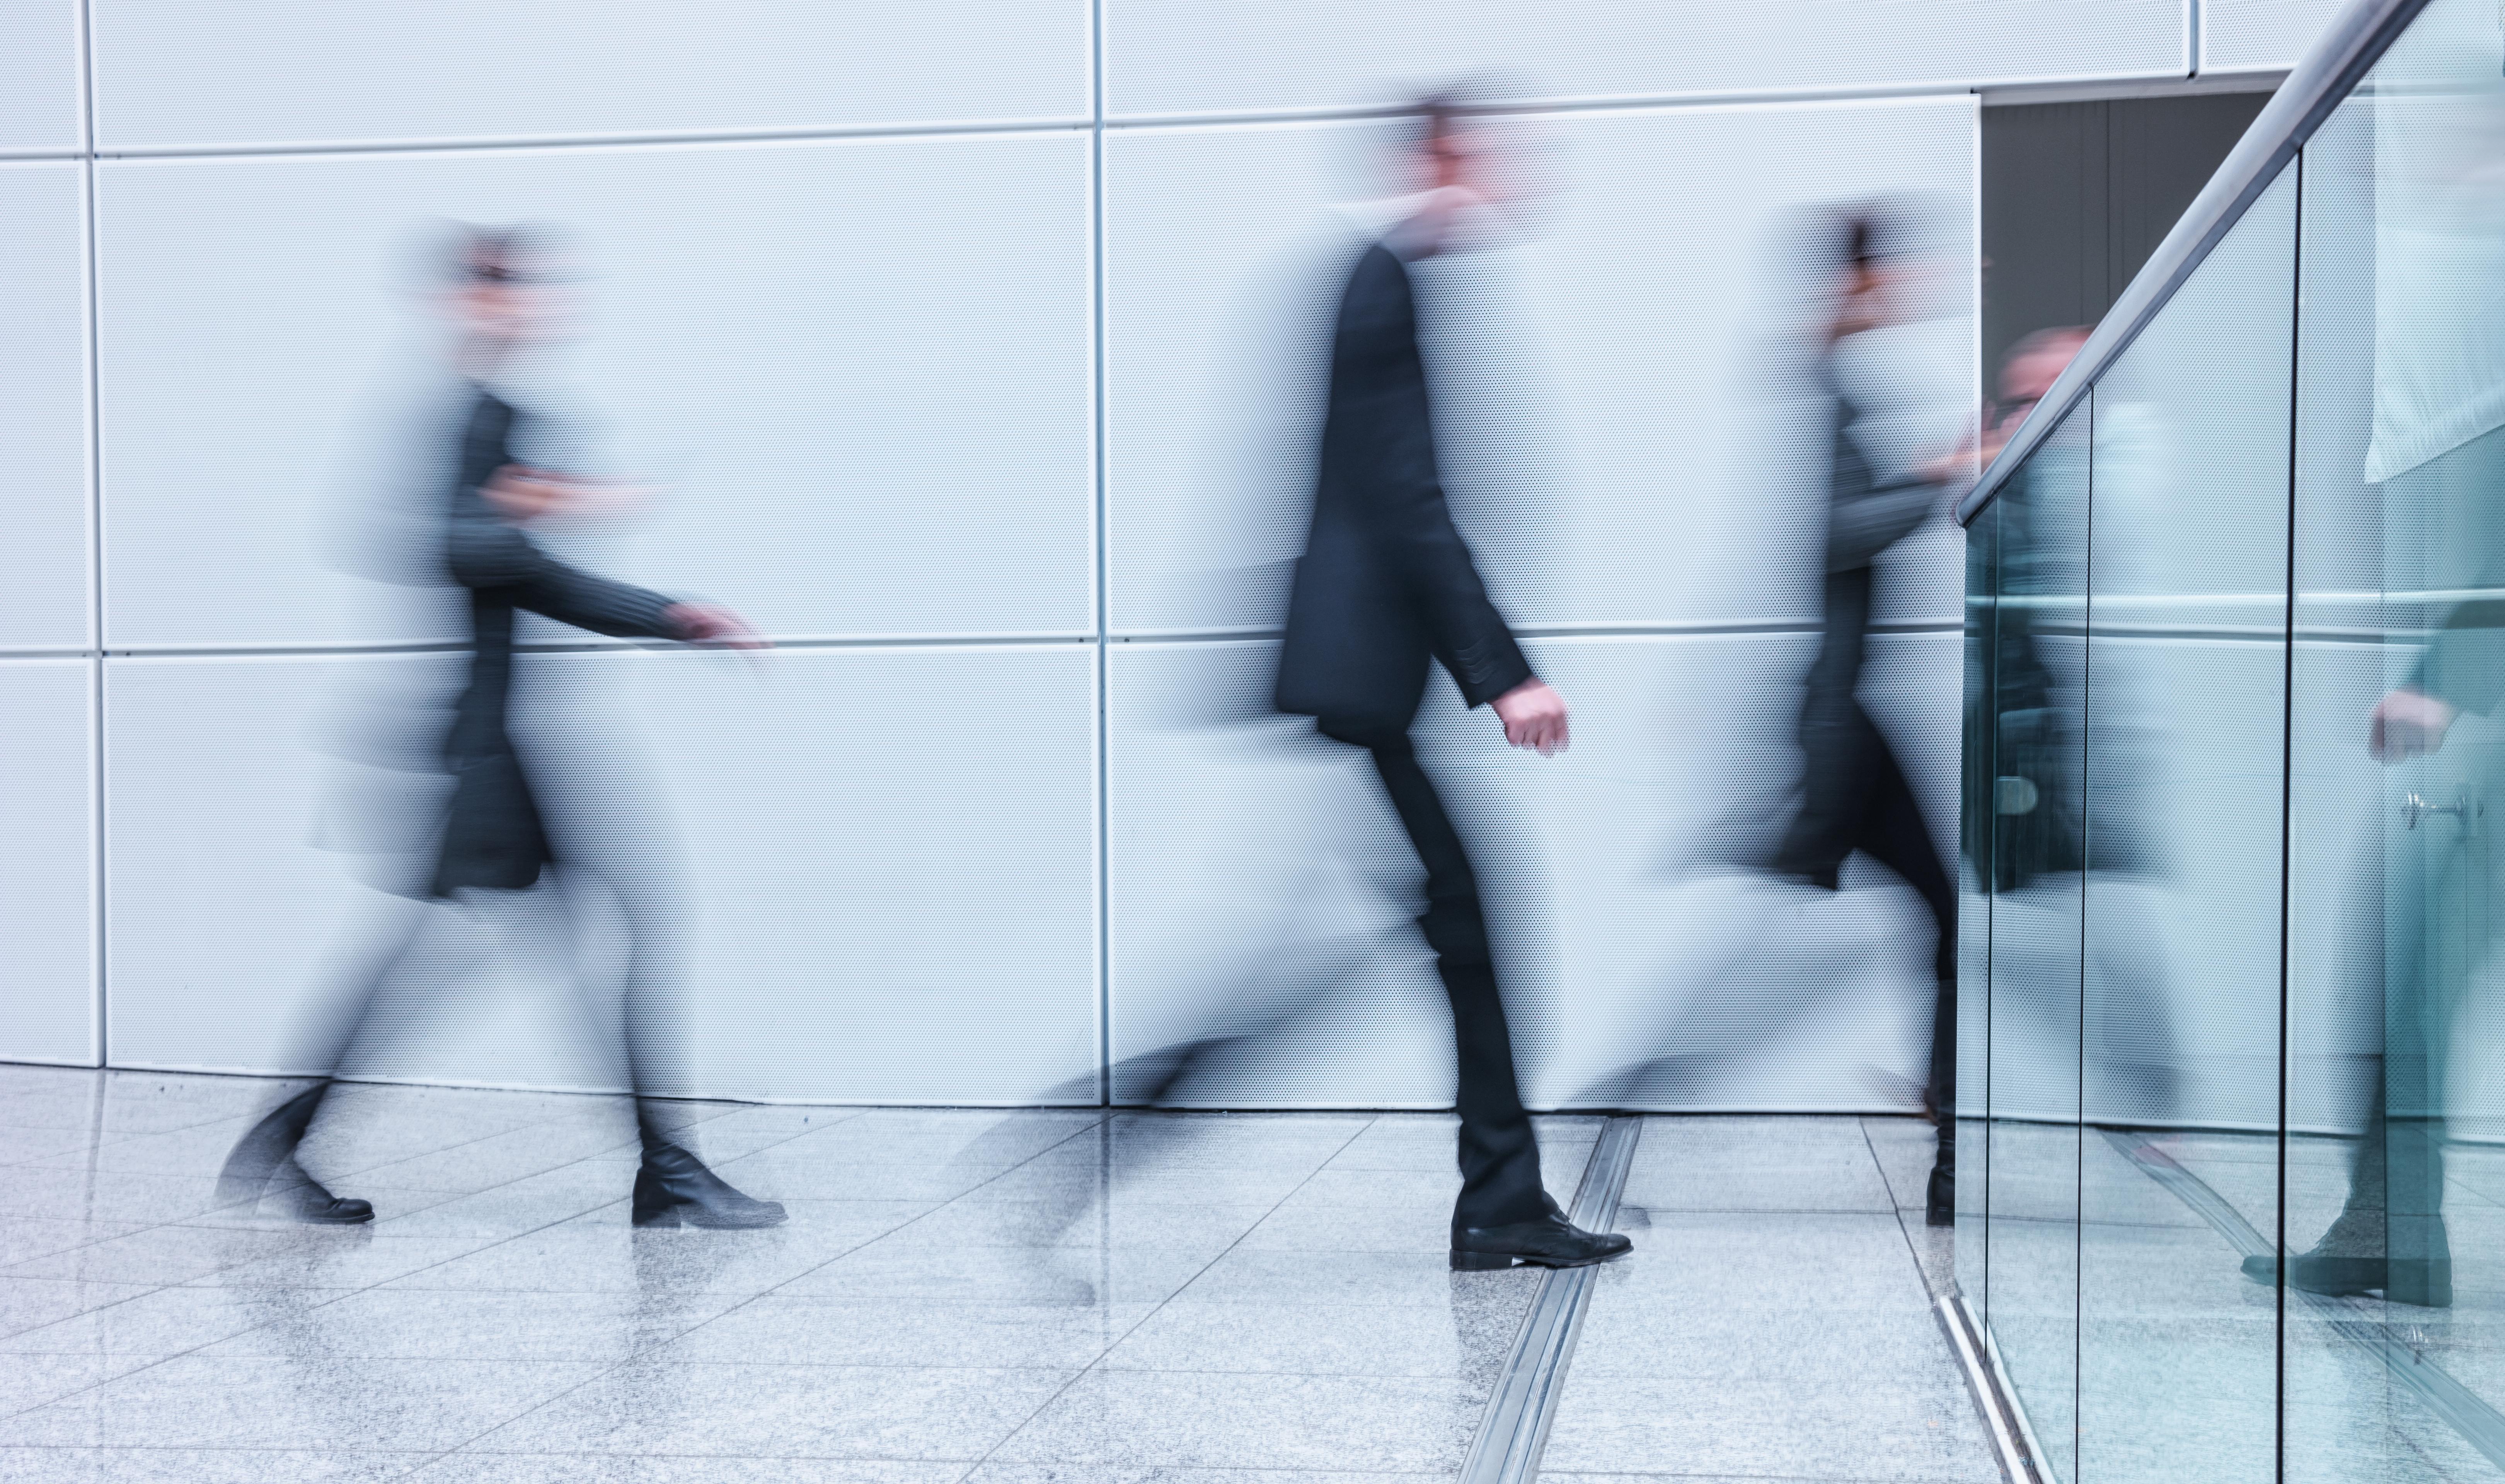 Blurred Motion Of People Walking On Floor In Office